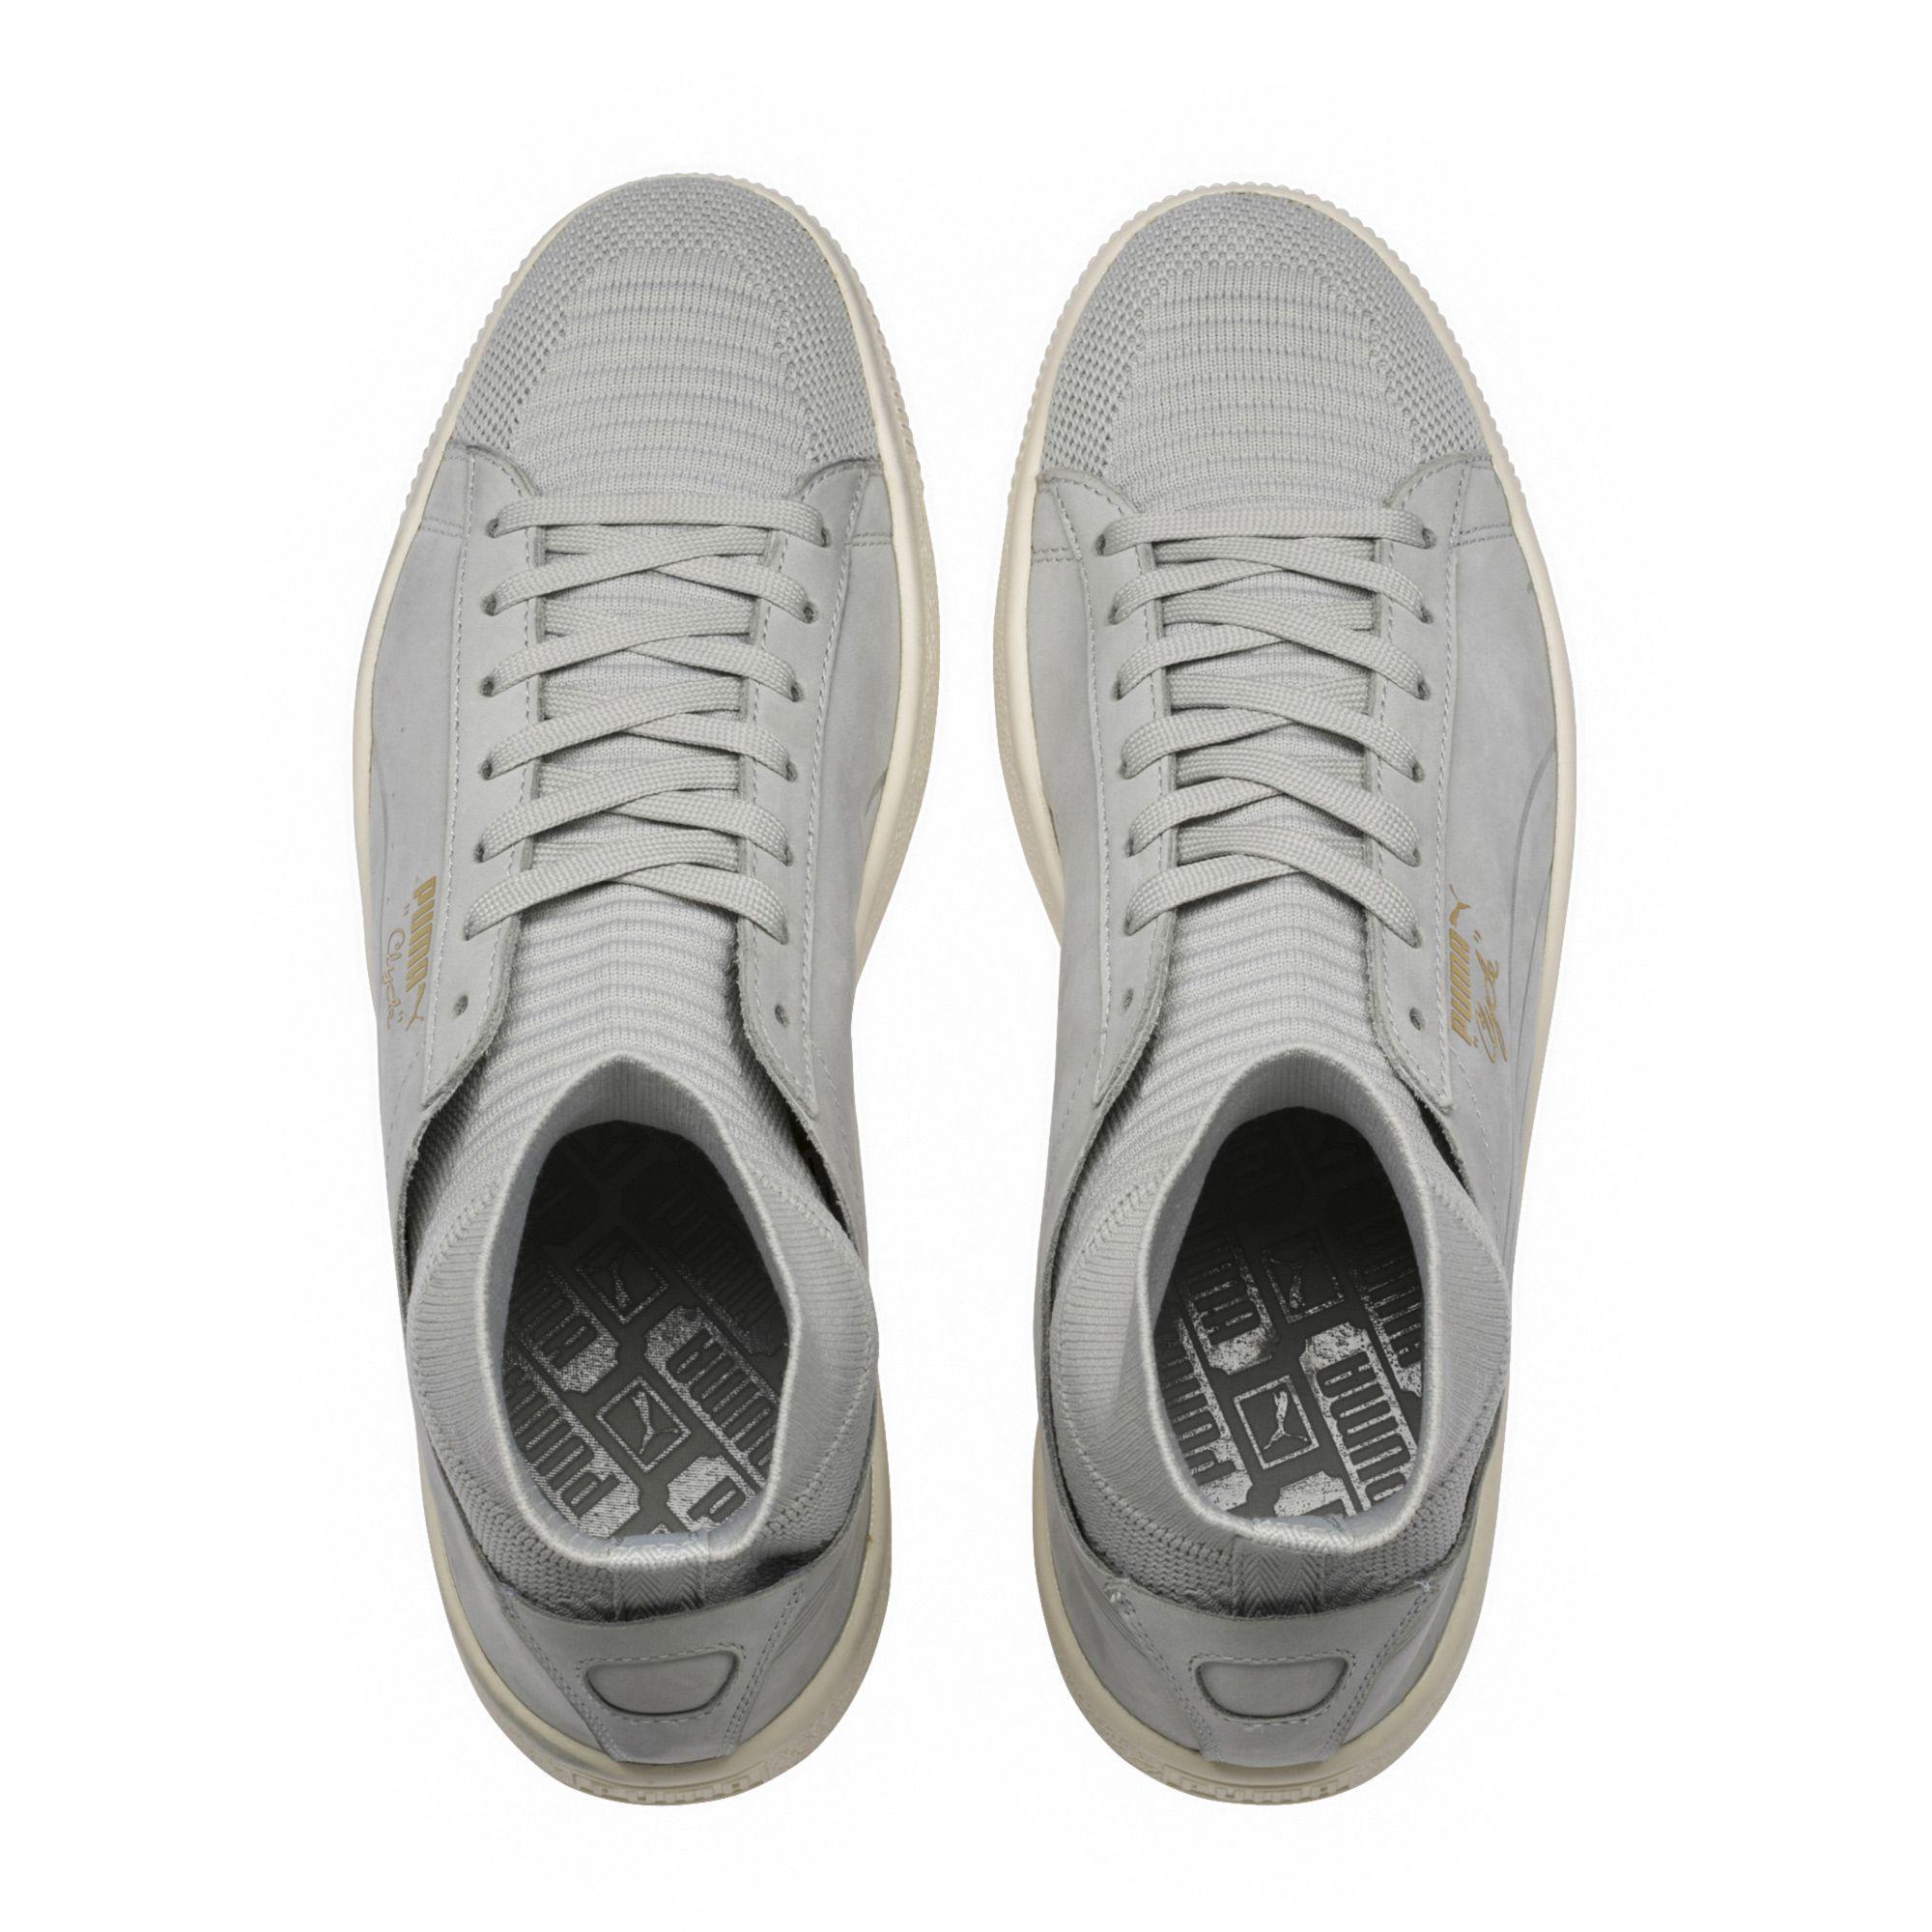 08e518bda793 Lyst - PUMA Clyde Sock Men s Sneakers in Gray for Men